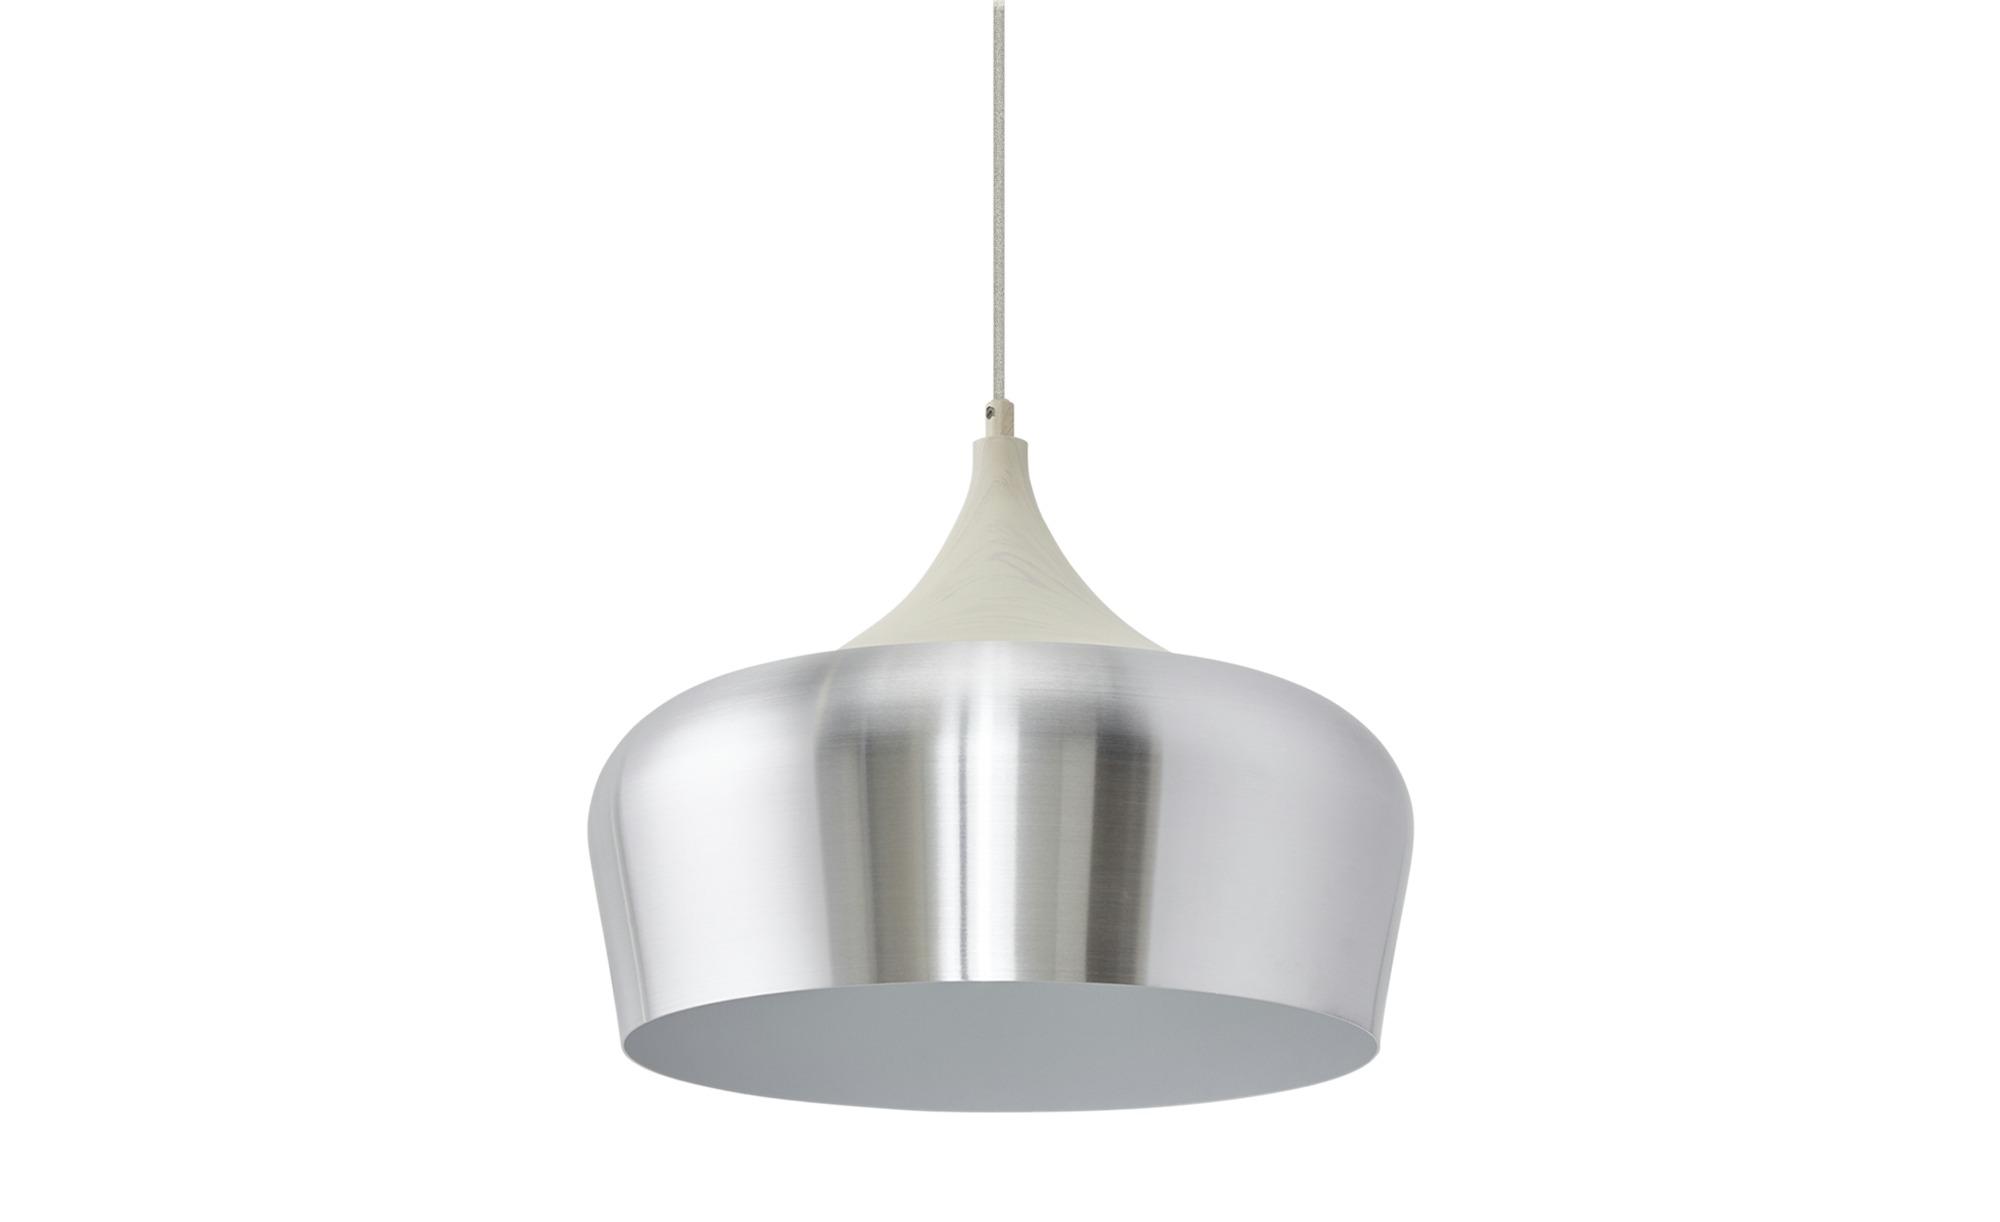 silber metall aluminium pendelleuchten online kaufen. Black Bedroom Furniture Sets. Home Design Ideas